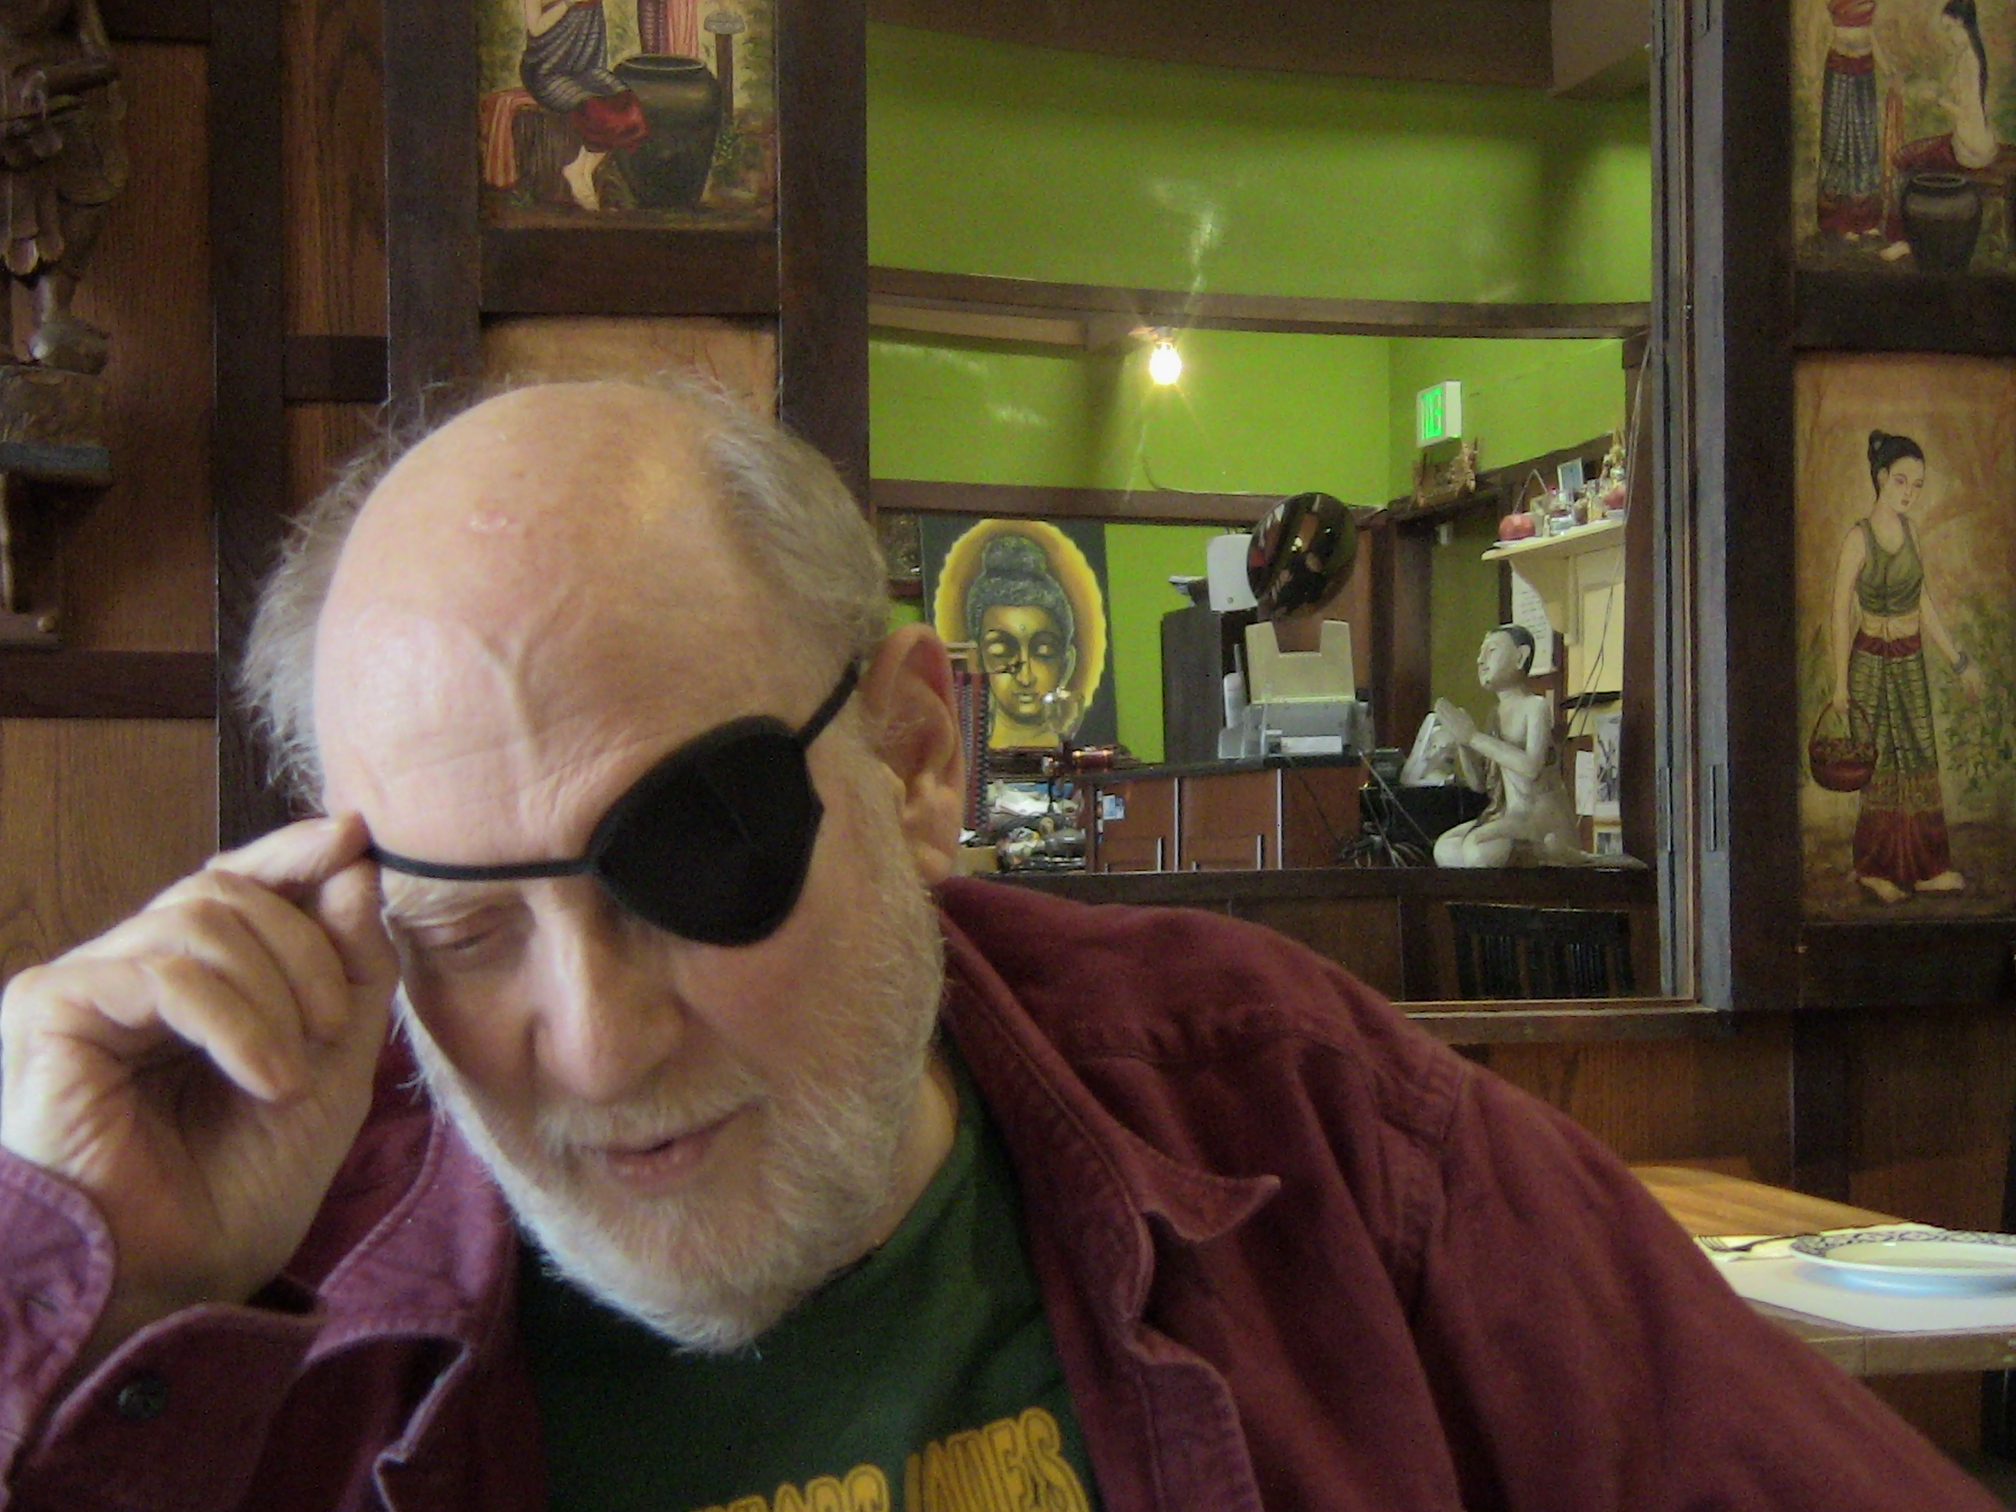 William 'Buzzy' Linhart, musician/cannabis activist Berkeley, CA 2012